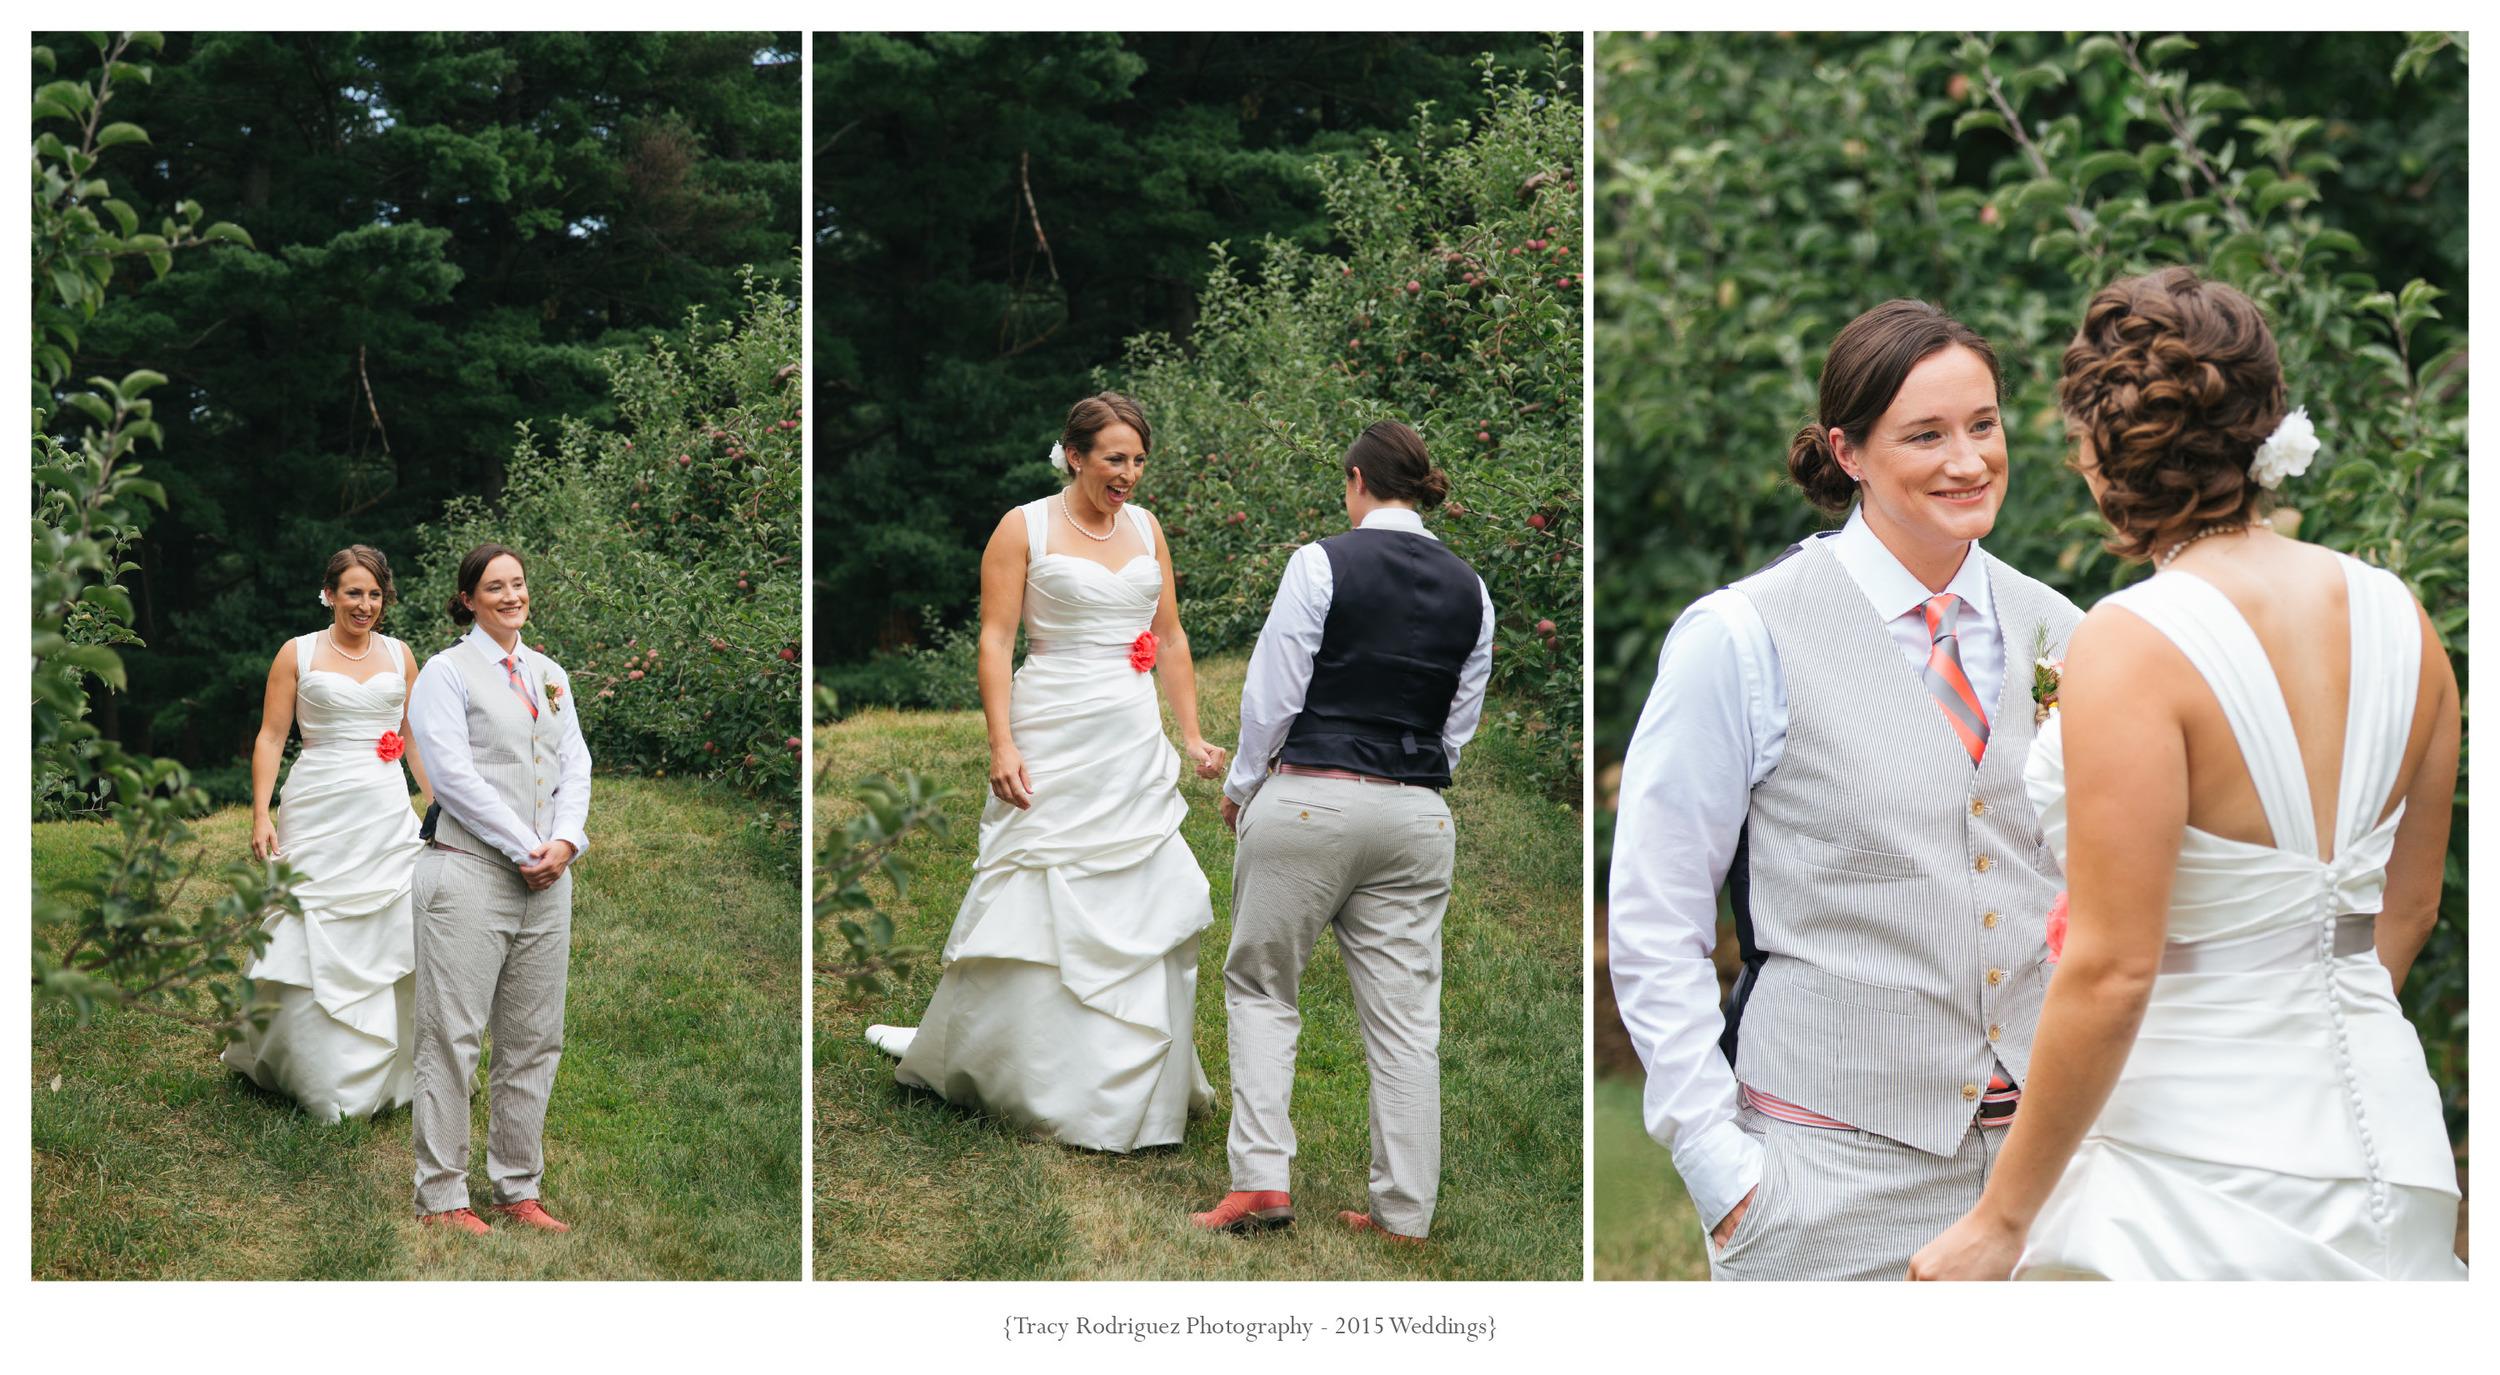 North Attleboro Wedding at Smolak Farms by Tracy Rodriguez Photography